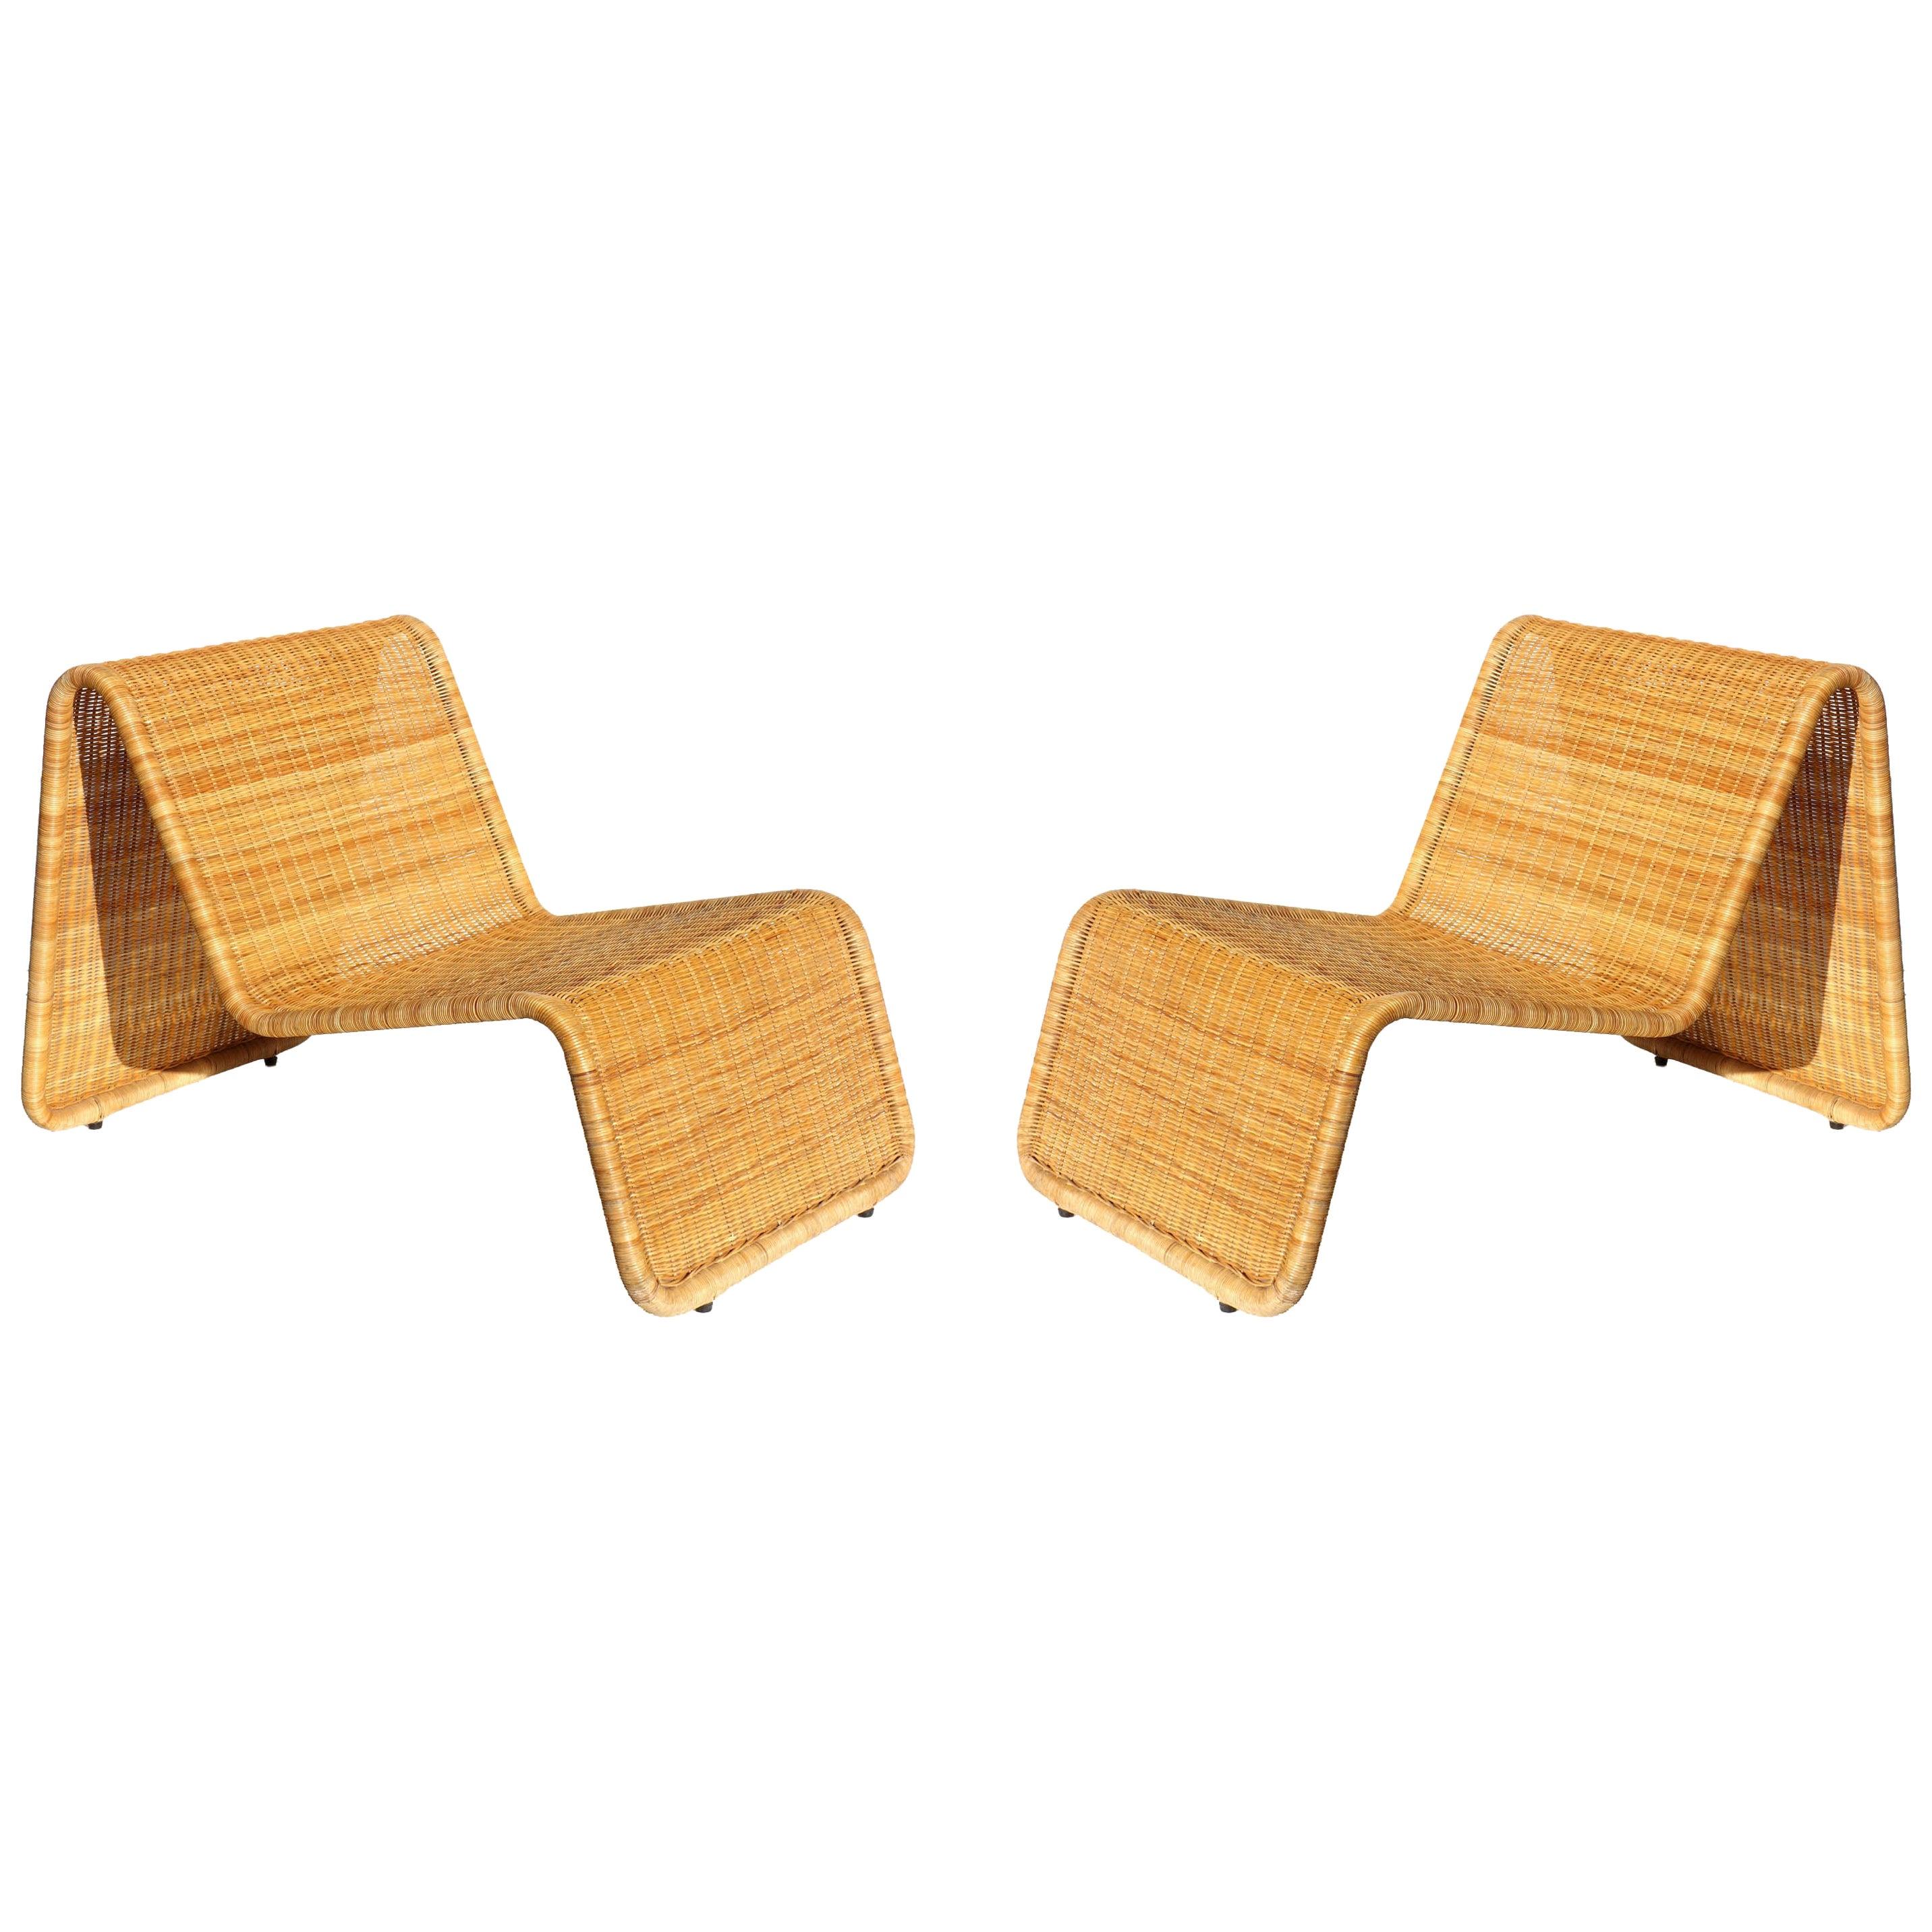 1950s Wicker Rattan Italian Design Midcentury Armchair Lounge Chair, Set of 2